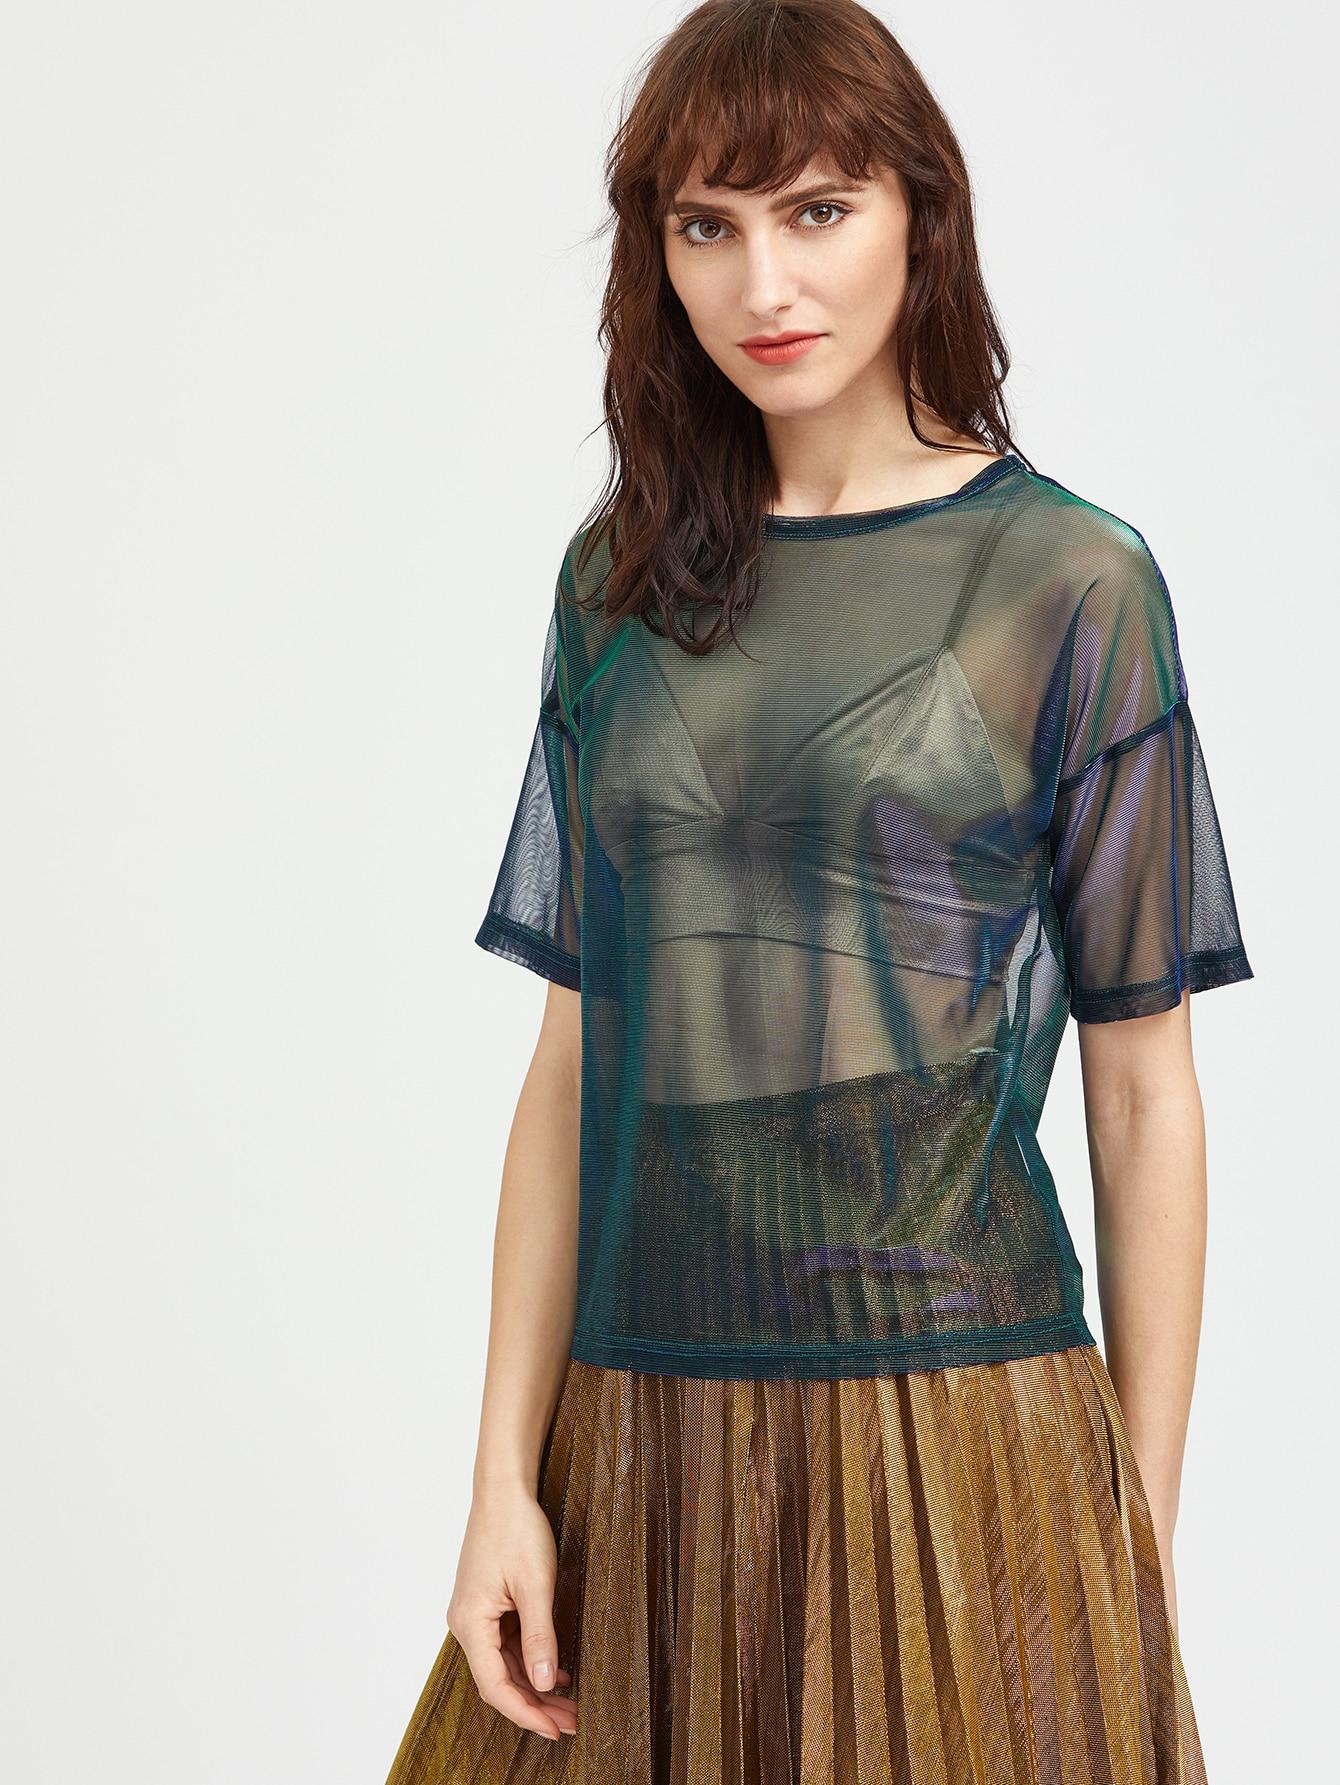 blouse170320705_2